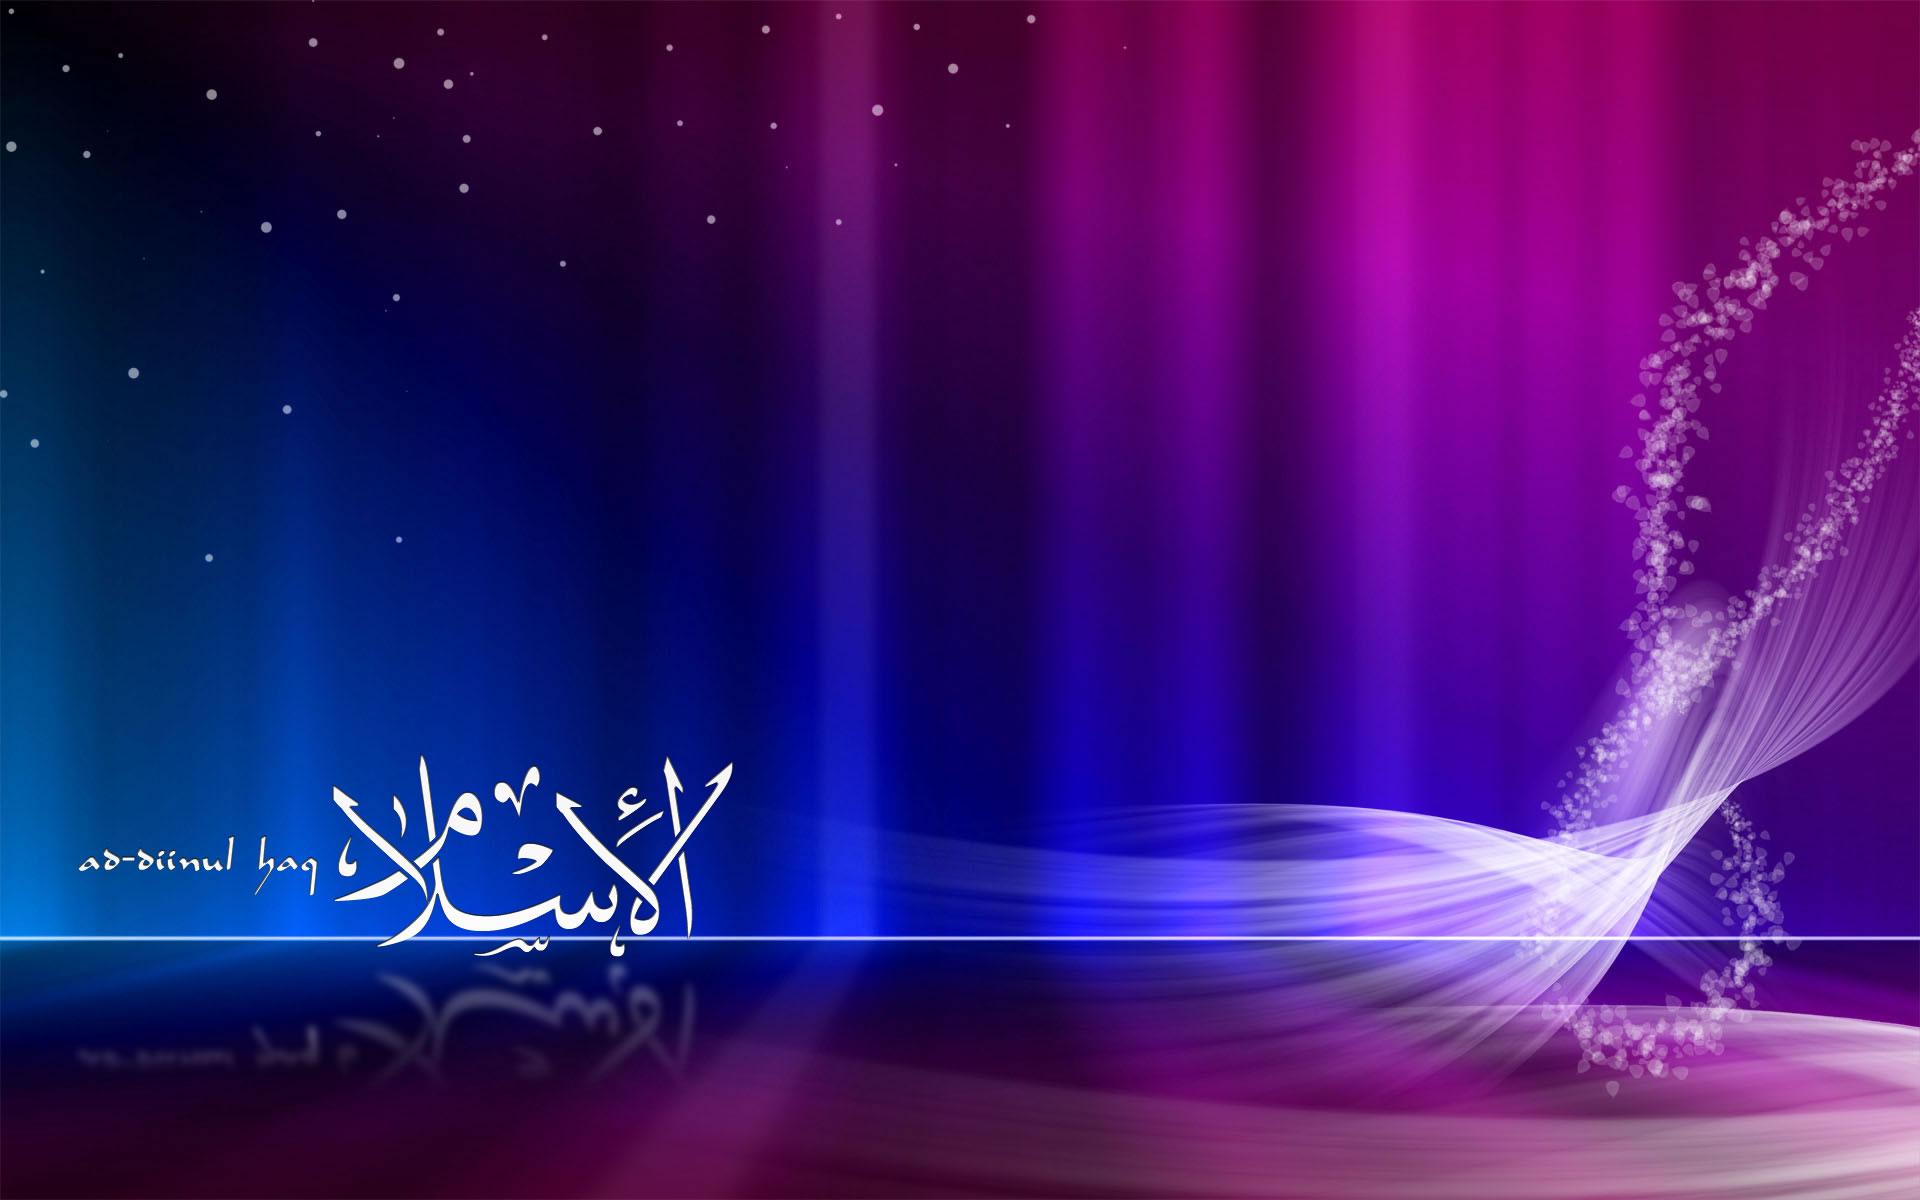 Islamic Hd Wallpapers 013